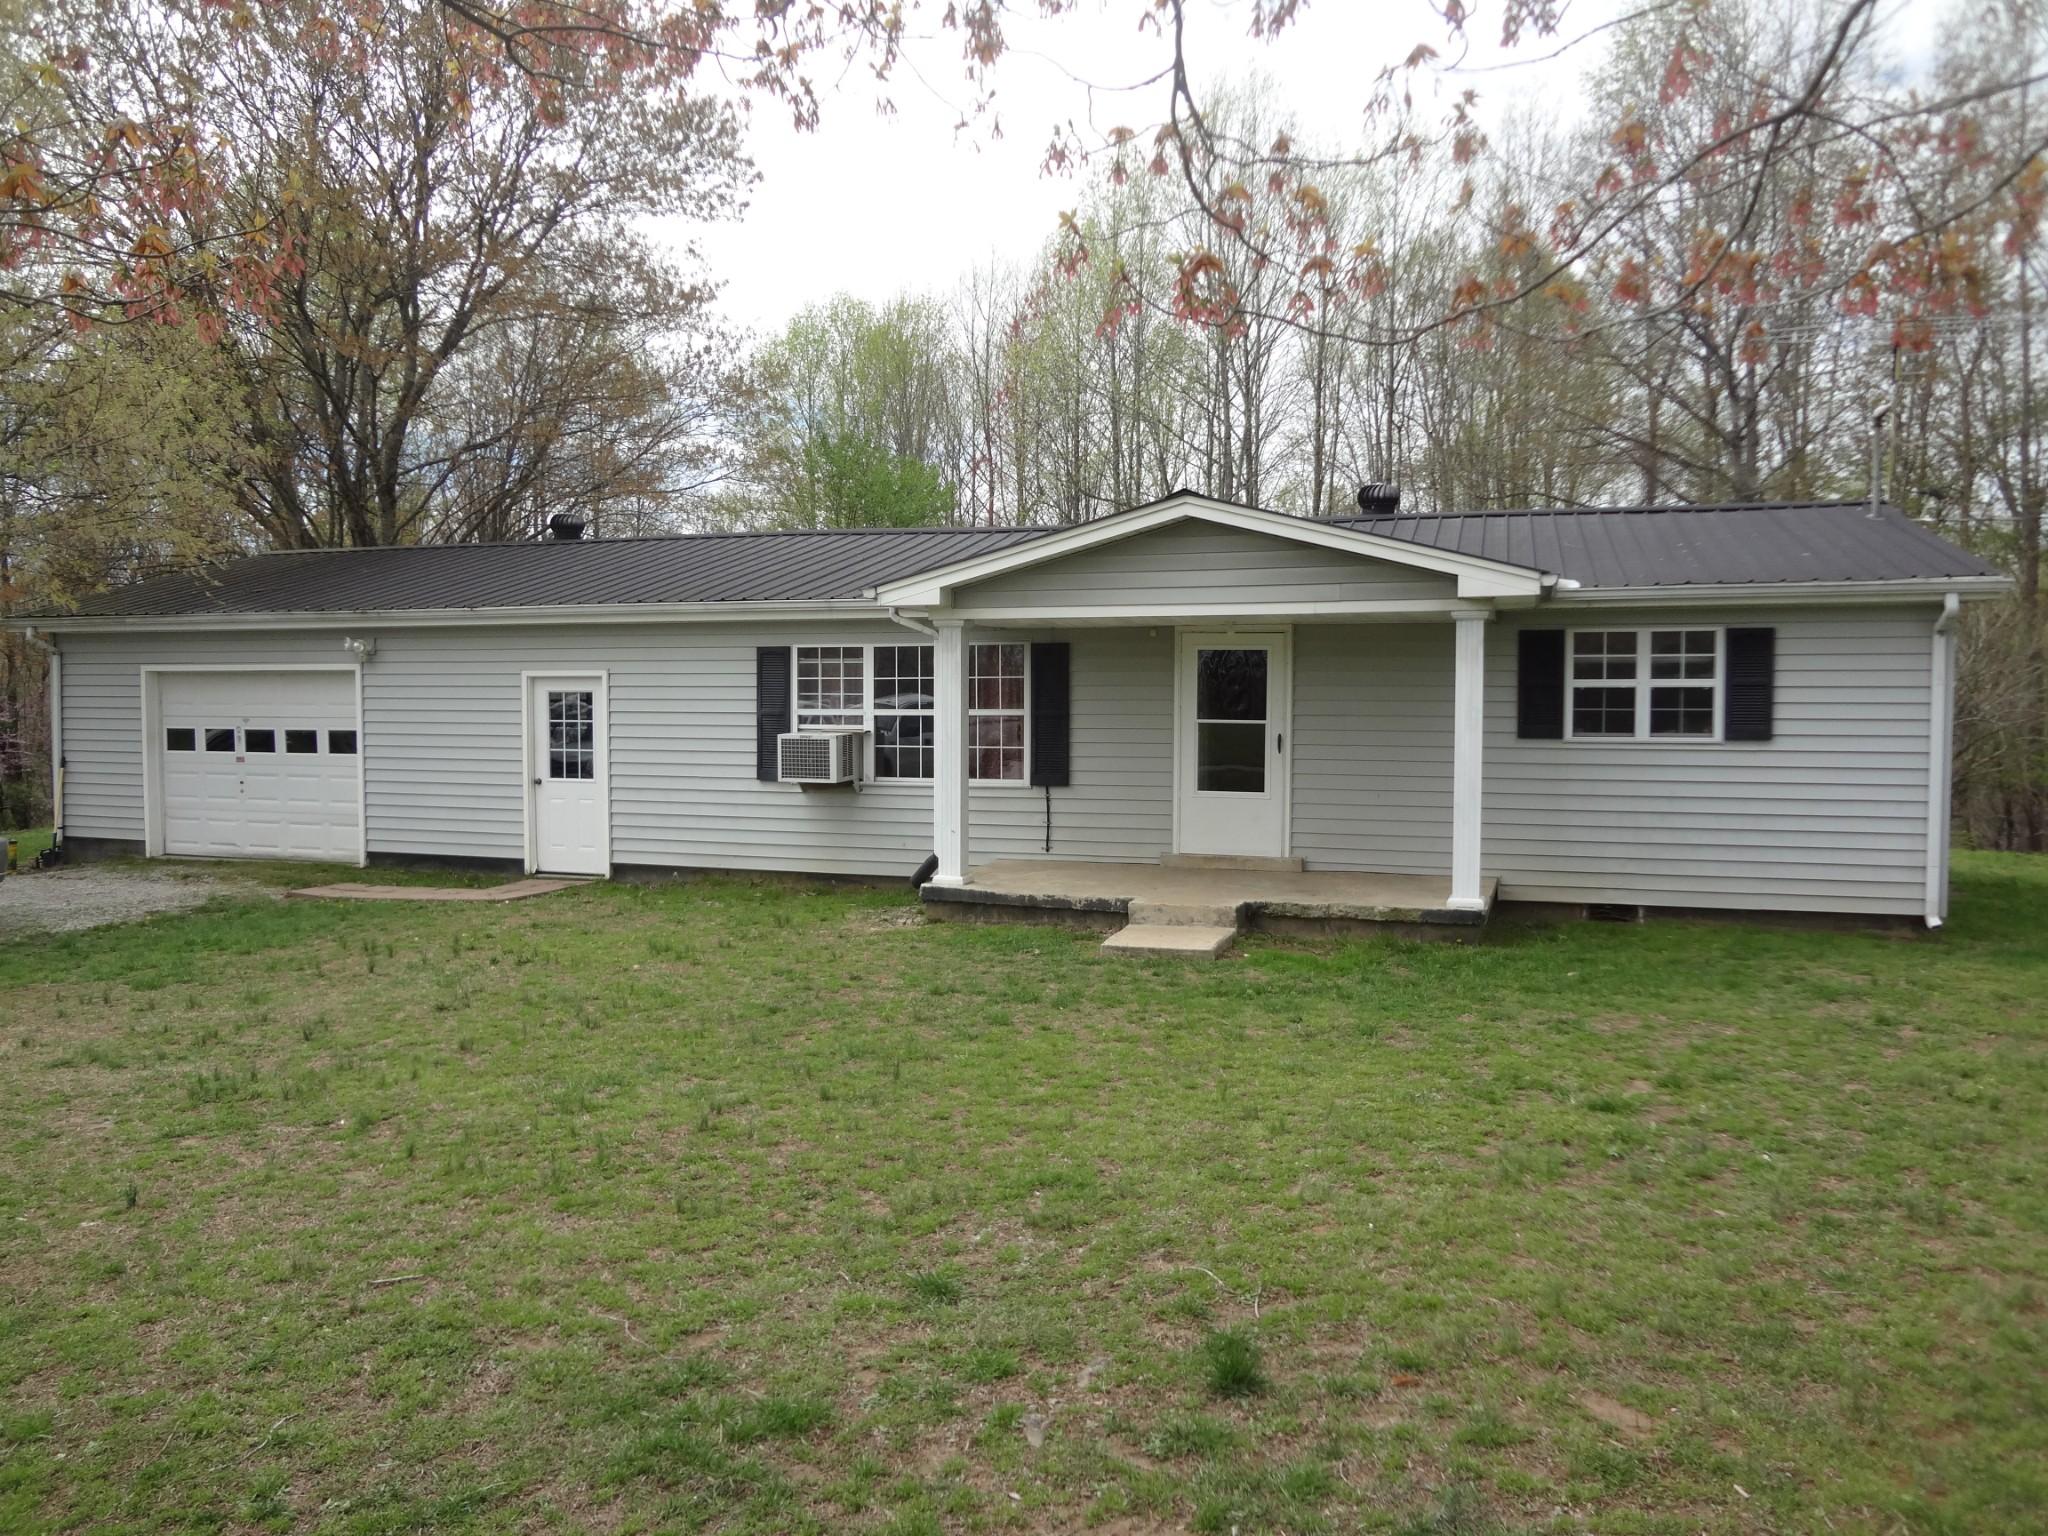 82 Sircy Ridge Ln, Pleasant Shade, TN 37145 - Pleasant Shade, TN real estate listing